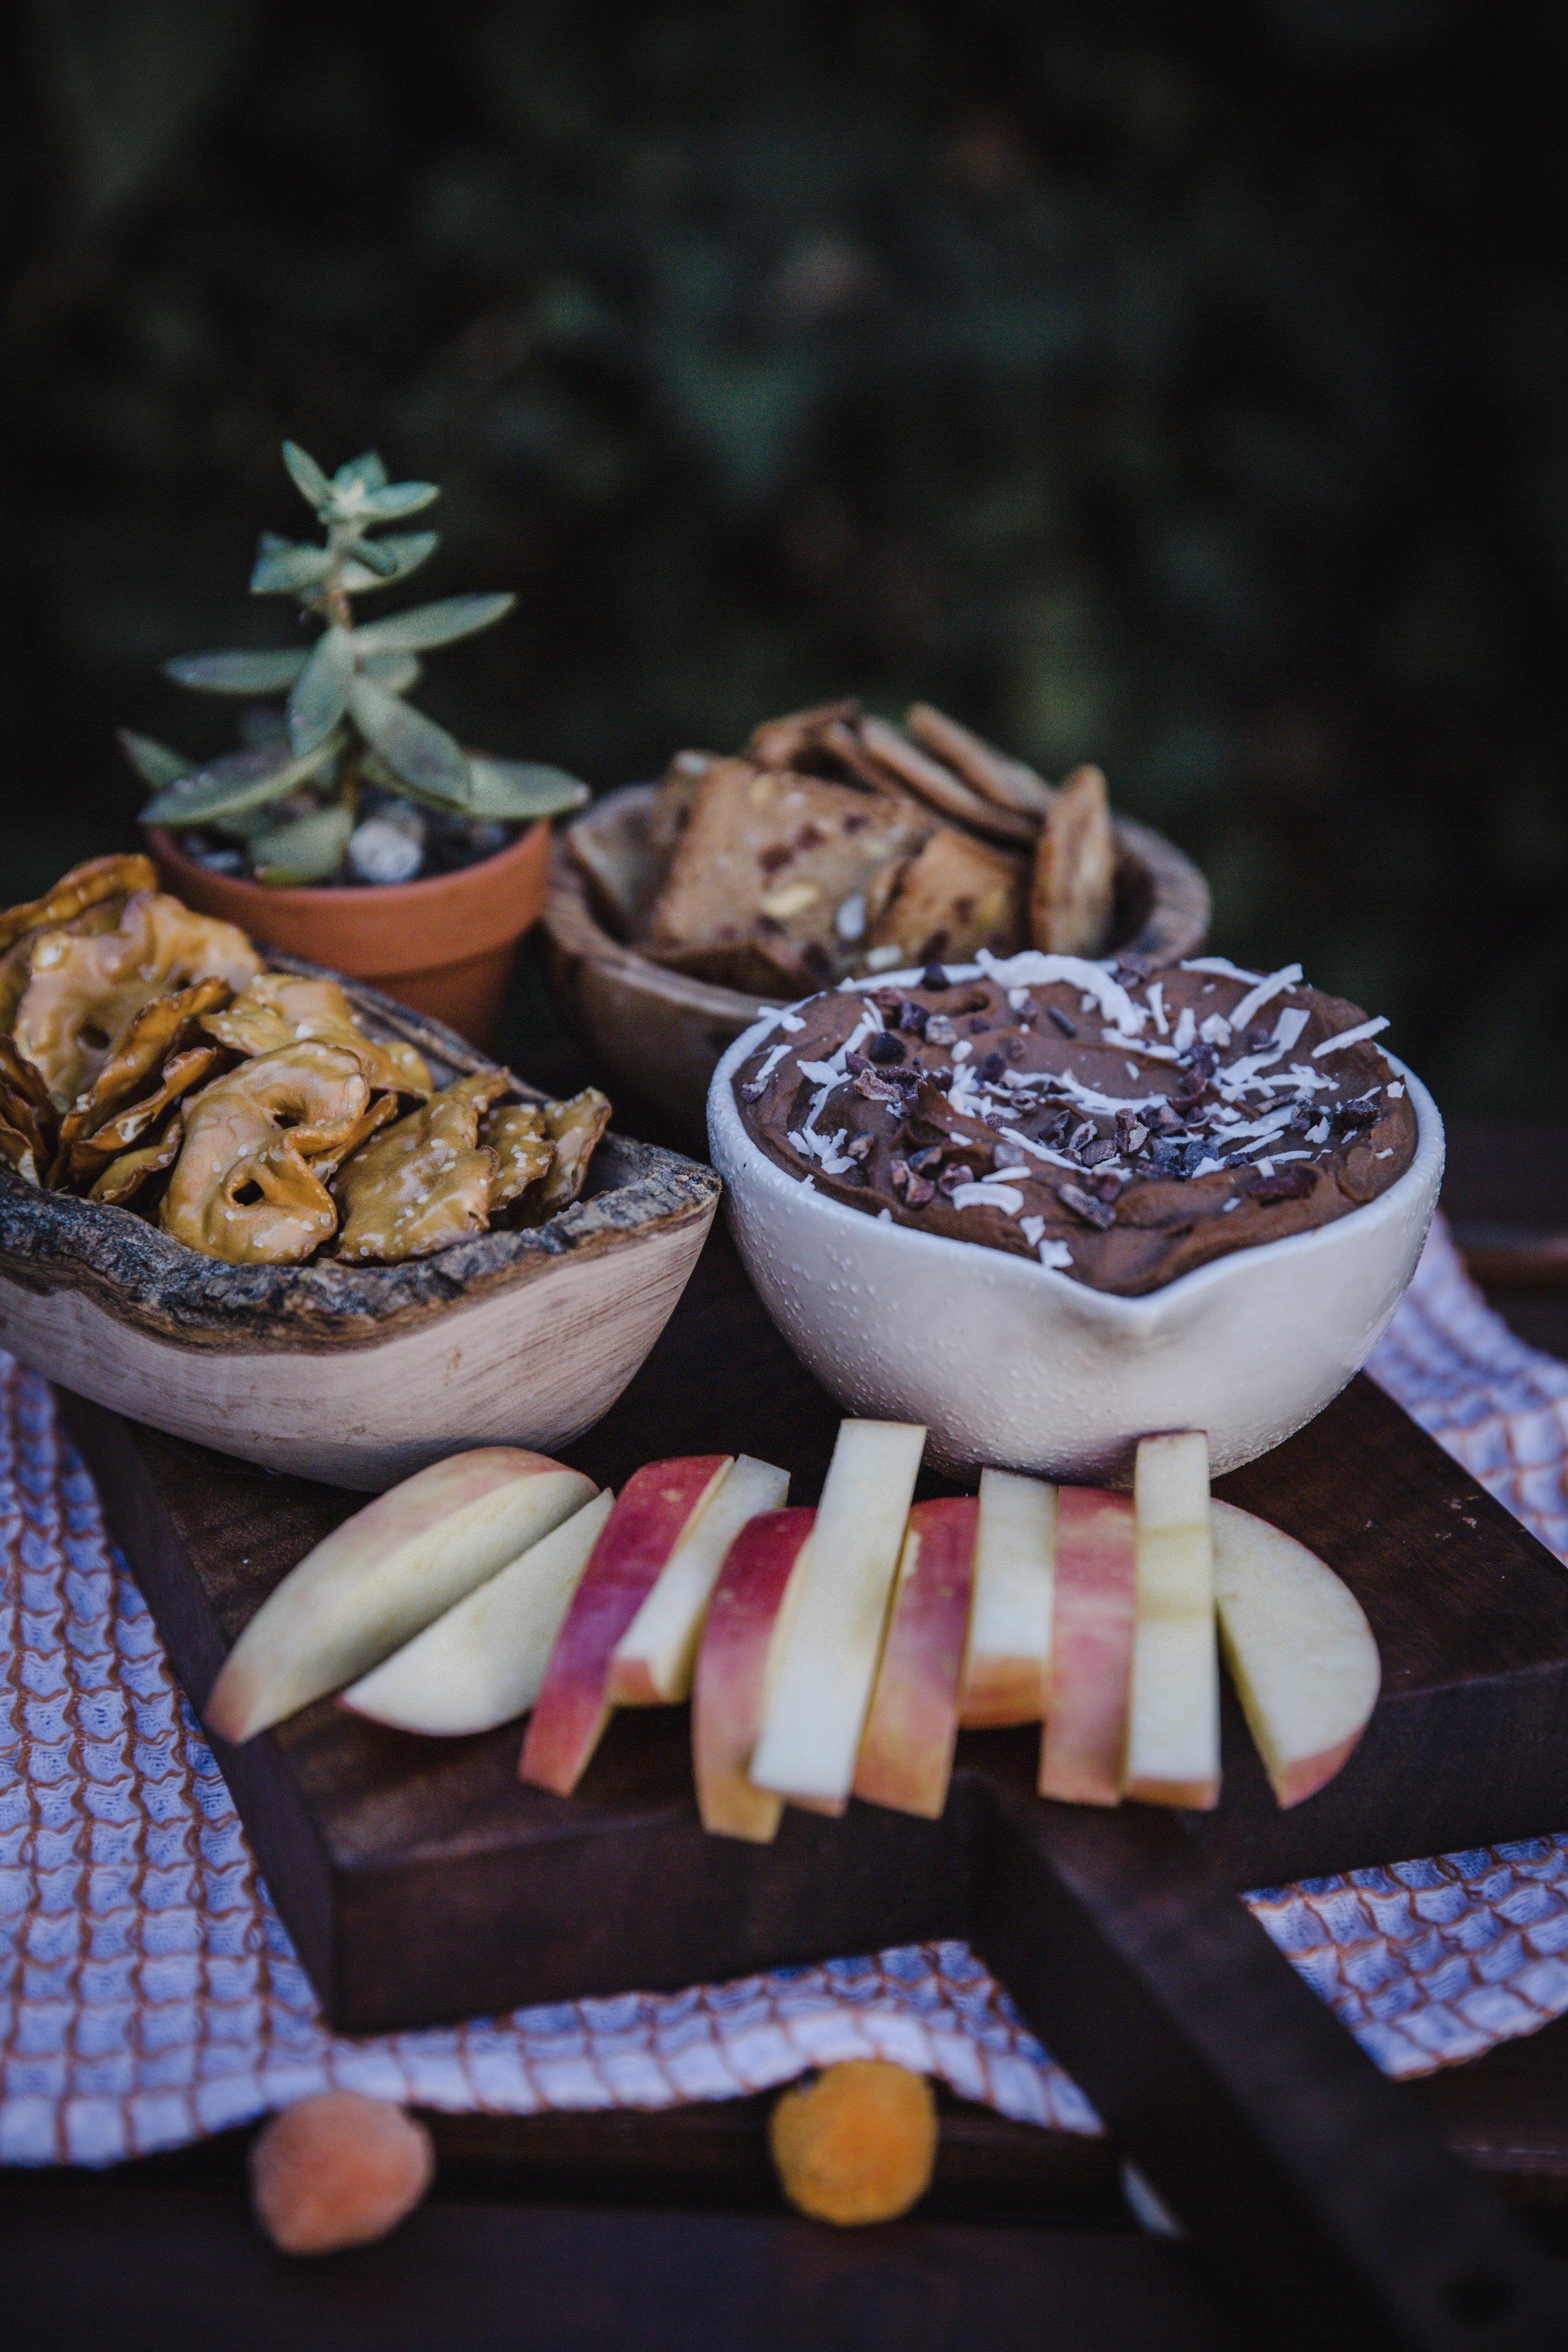 3-Ingredient Chocolate Hummus